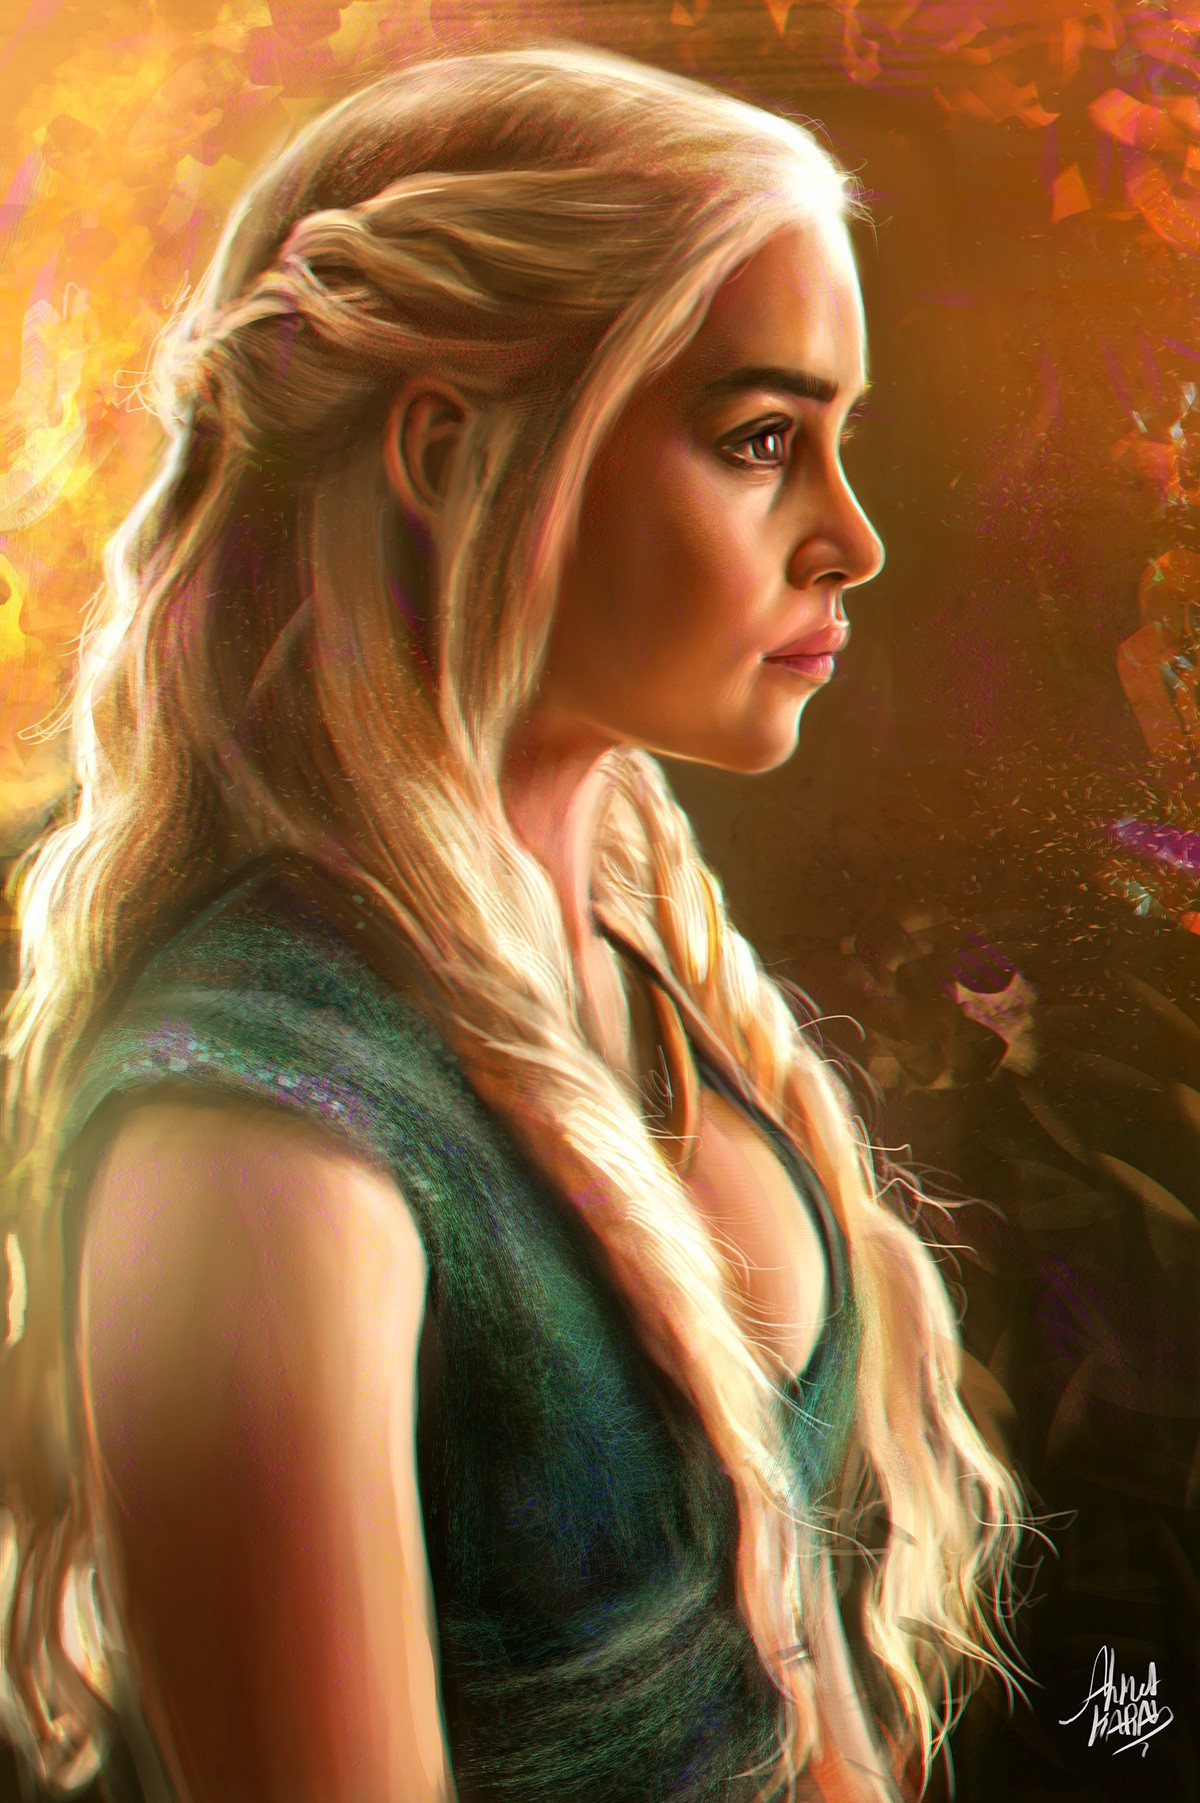 The Binary Extremes of Daenerys Targaryen   by Cherish Kim   Towards Data  Science